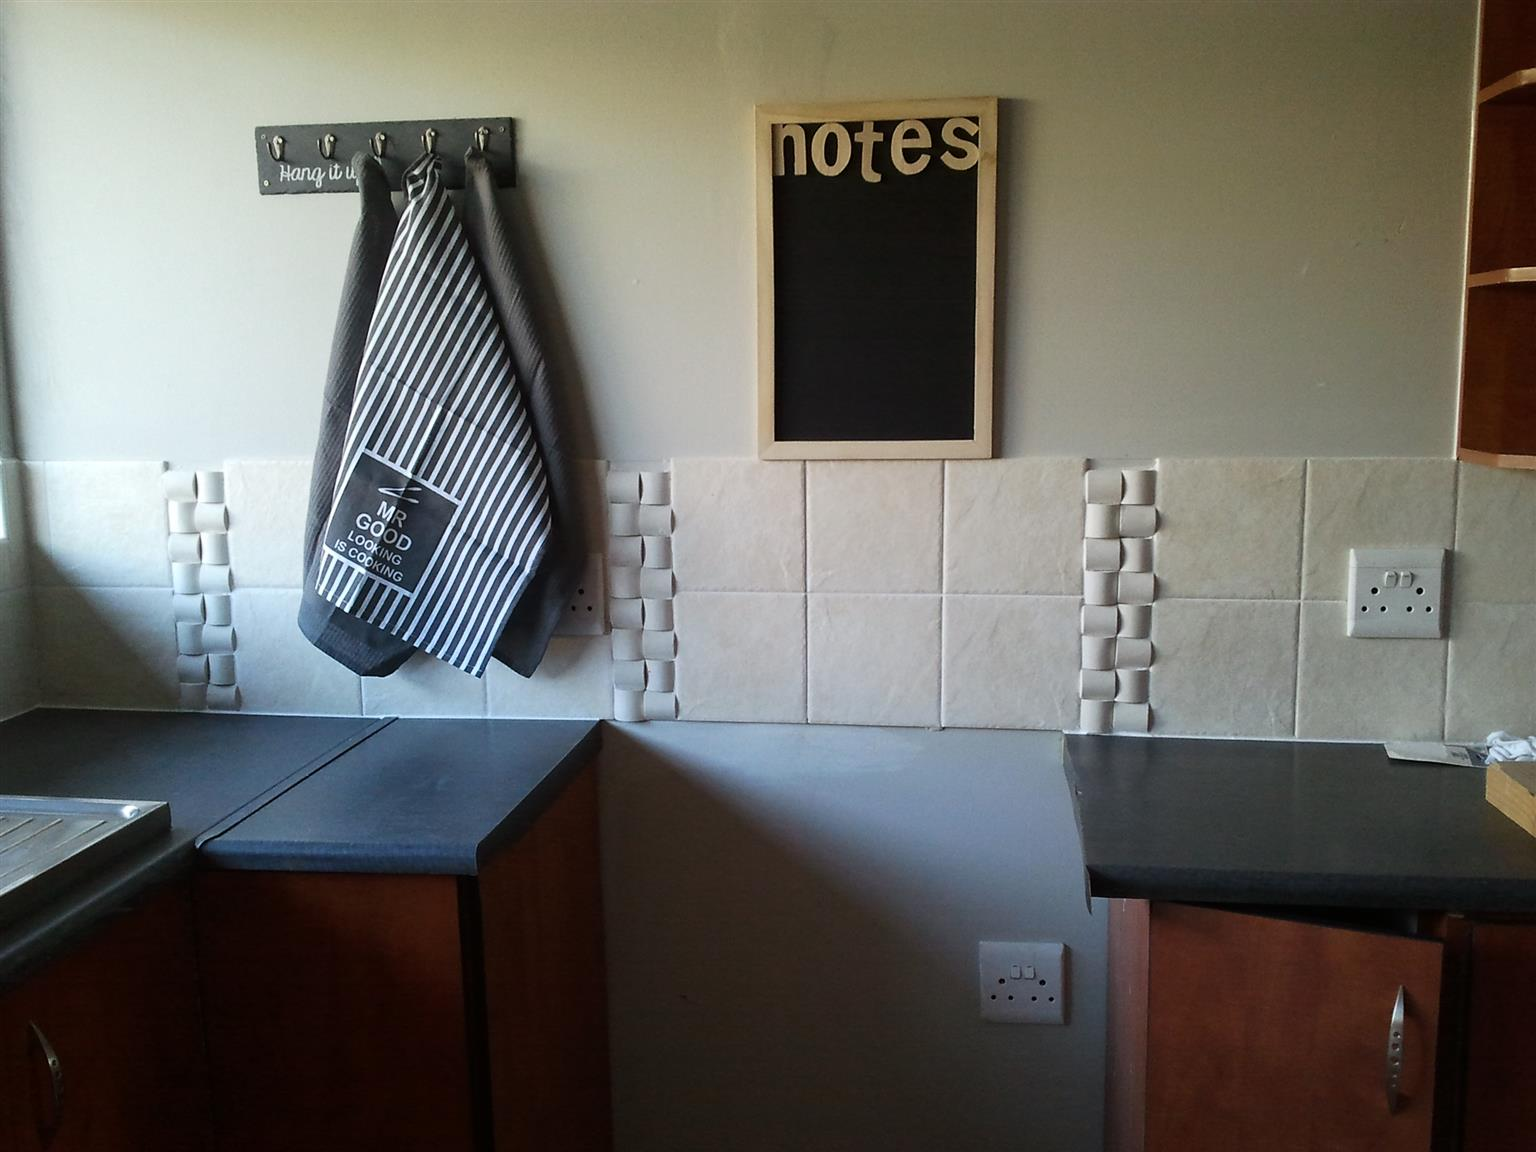 2 Bedroom Garden flat Gezina -Moot R6800 W/L included